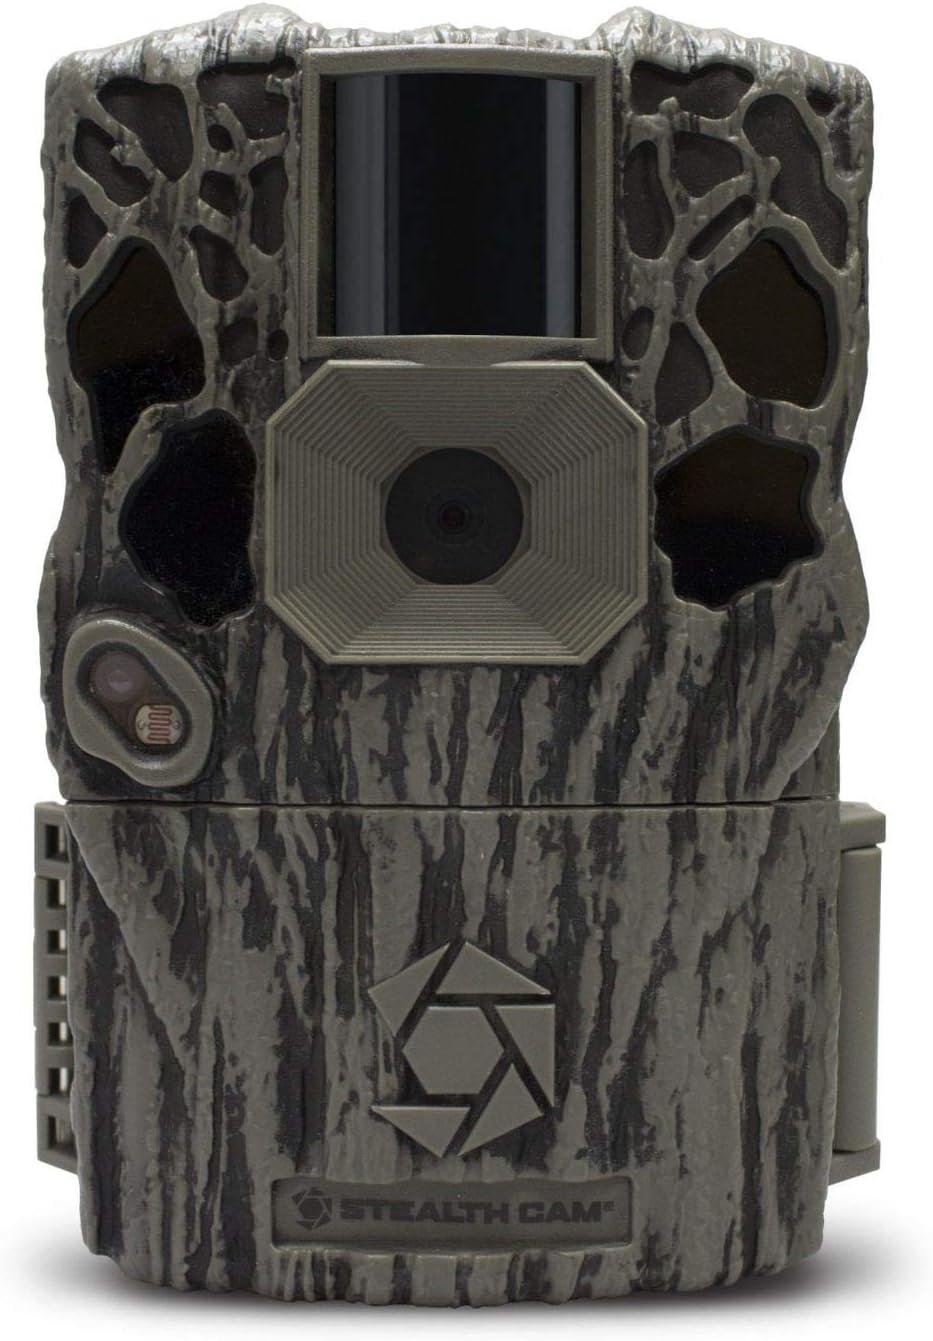 Stealth Cam FLX - 30MP WiFi - Bluetooth Camera, 1080P Video Recording, Smart Illumination Technology, 42 IR Emitters, Multi, One Size